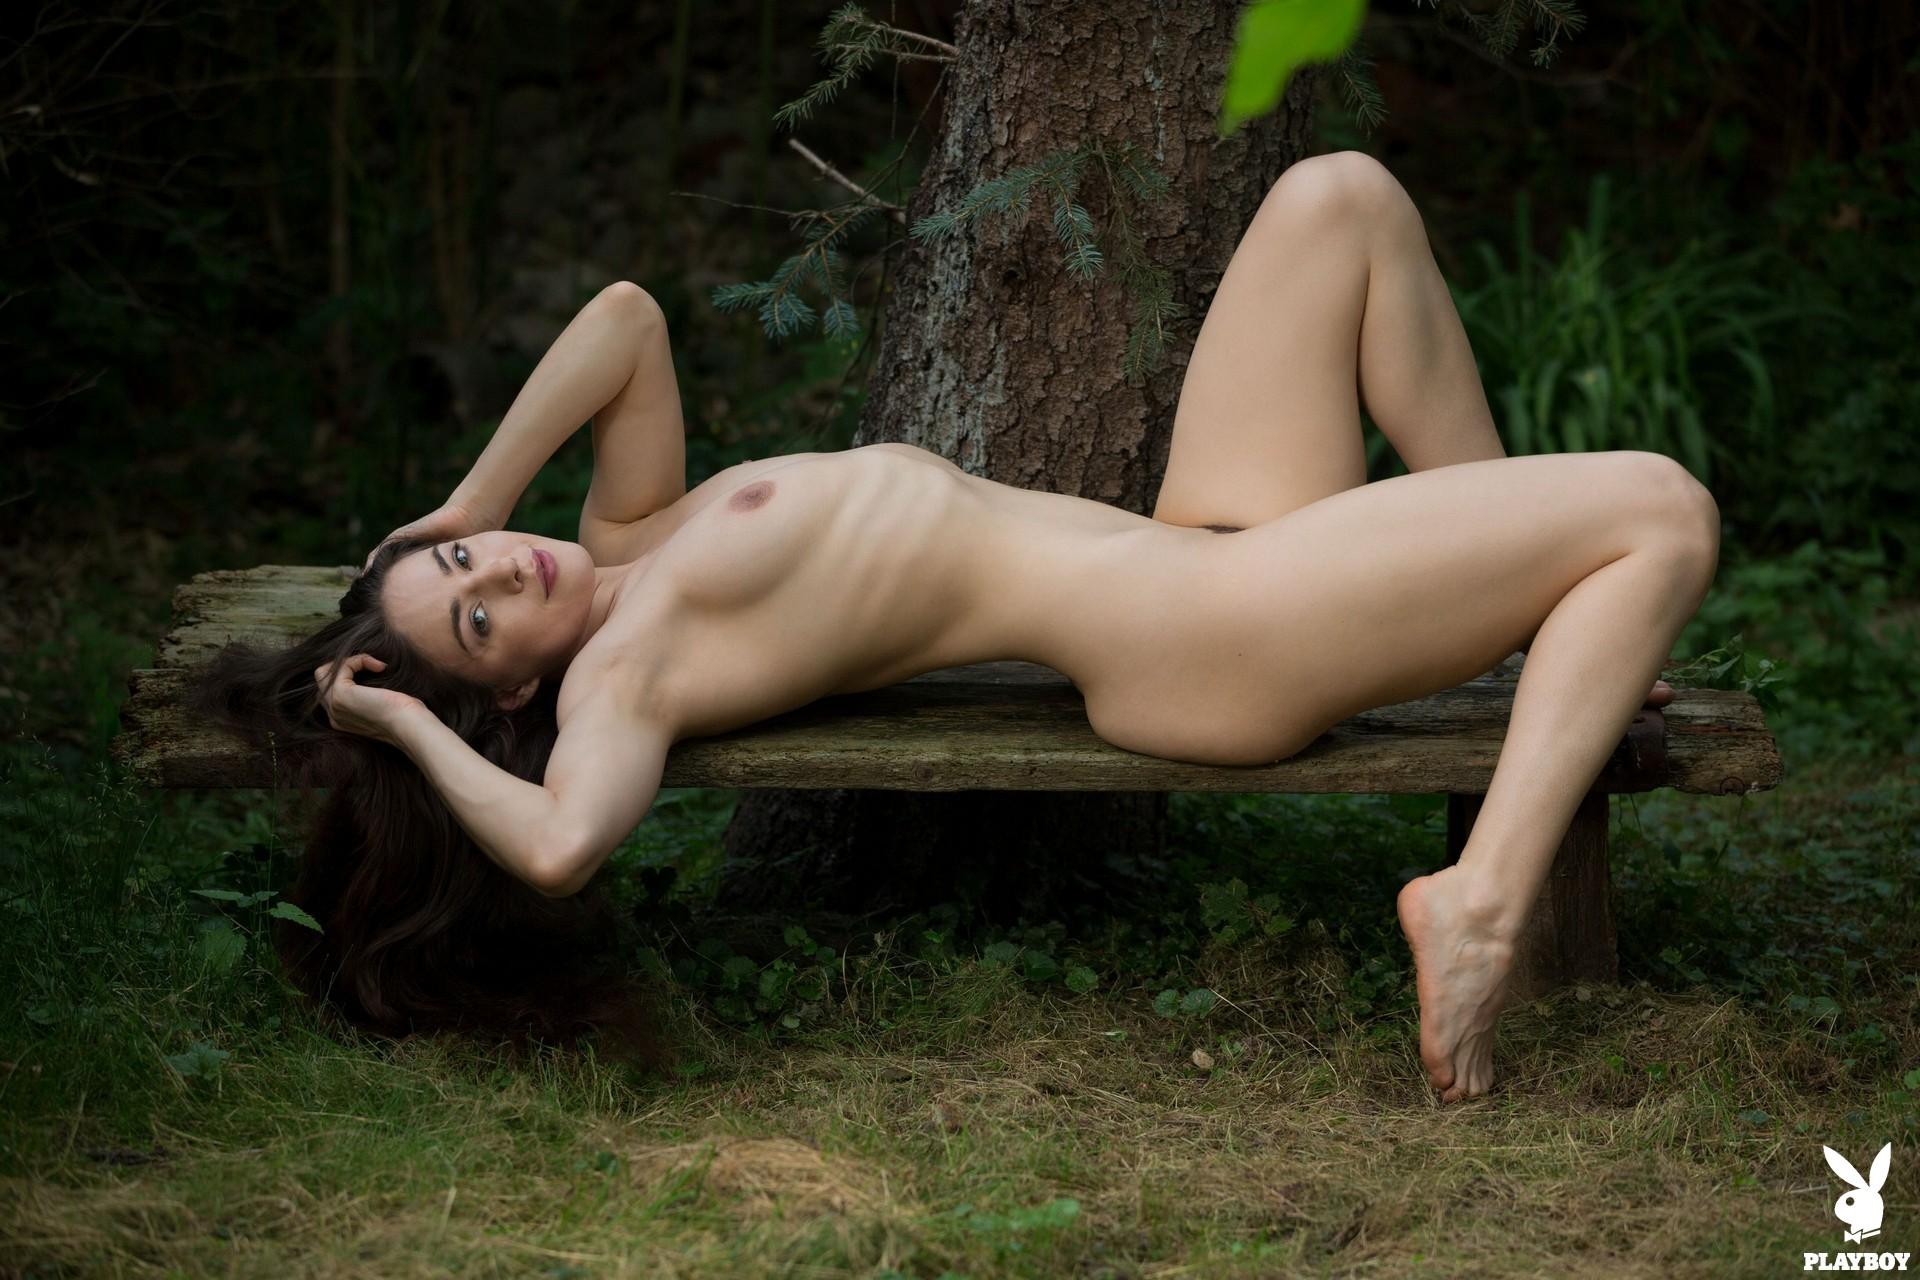 Joy Draiki in Mystic Escape - Playboy Plus 26